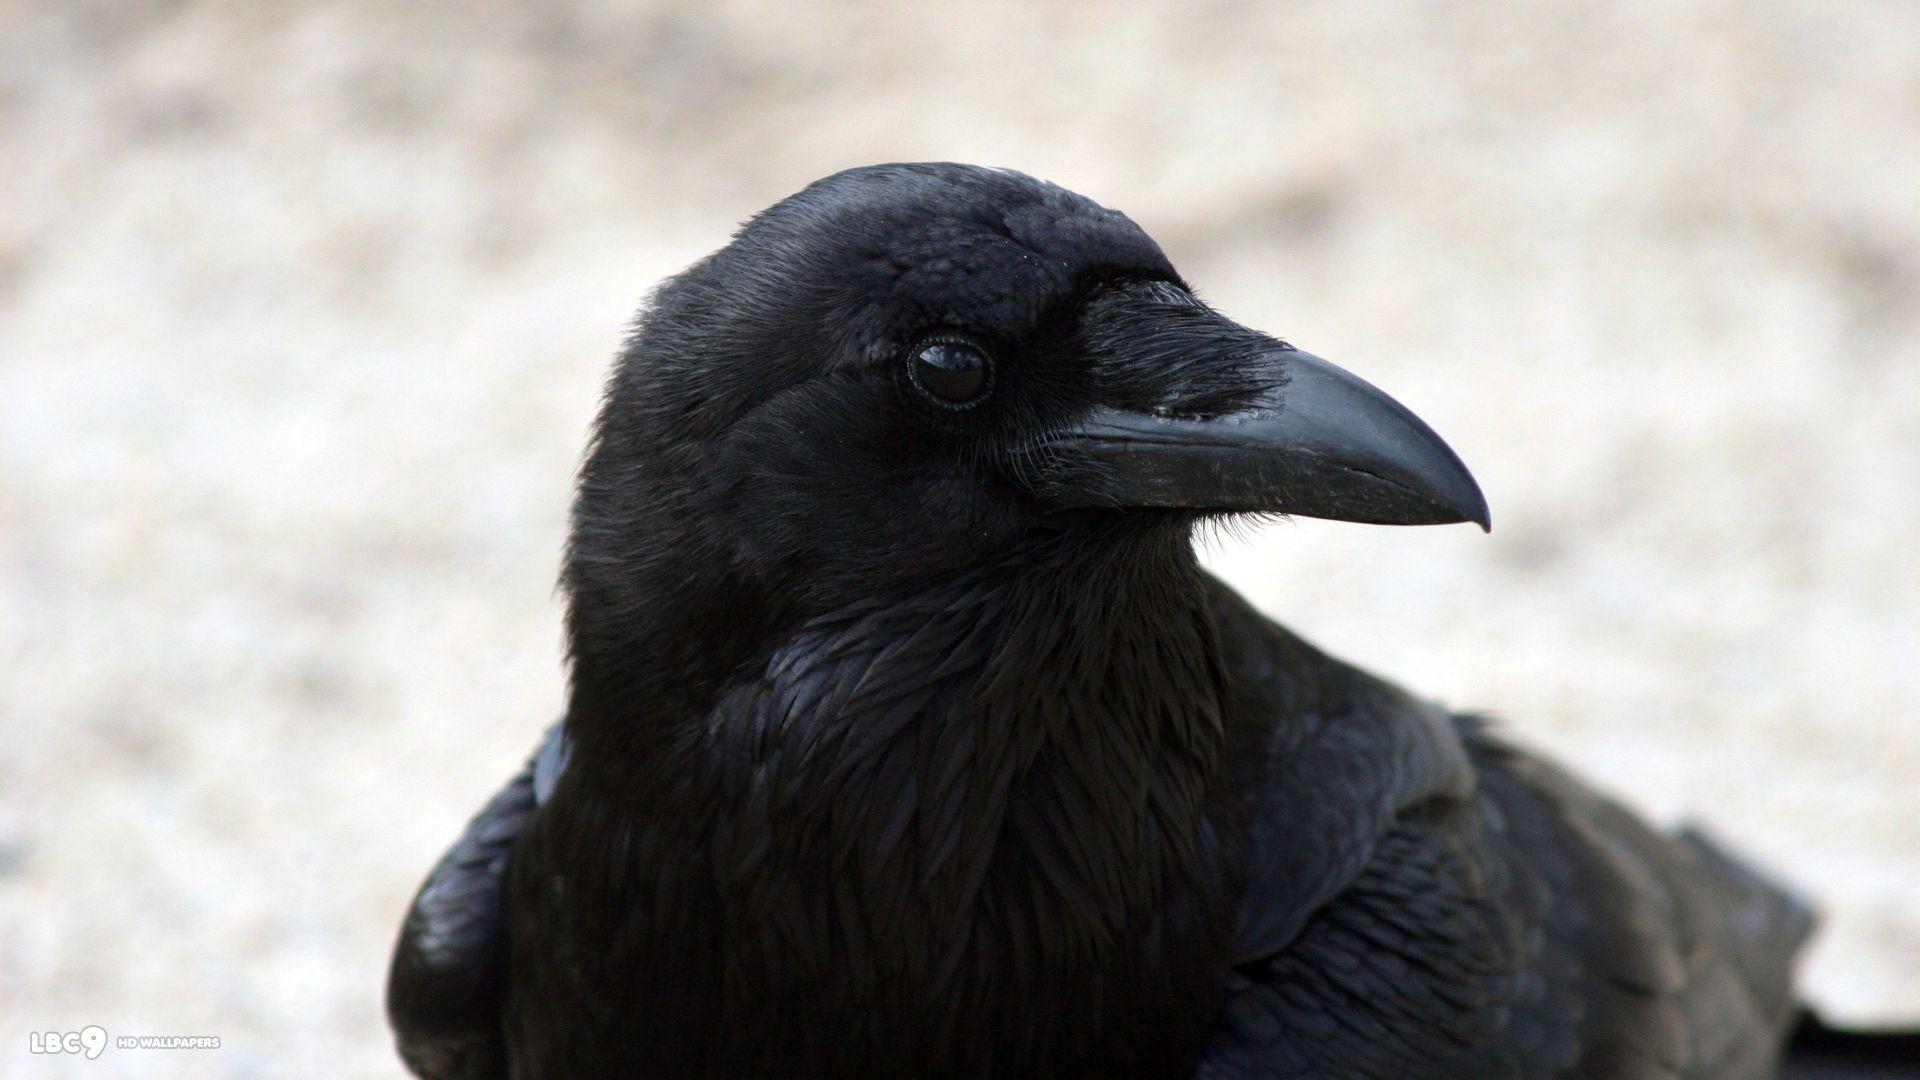 raven wallpaper / birds hd backgrounds 1024×768 Raven